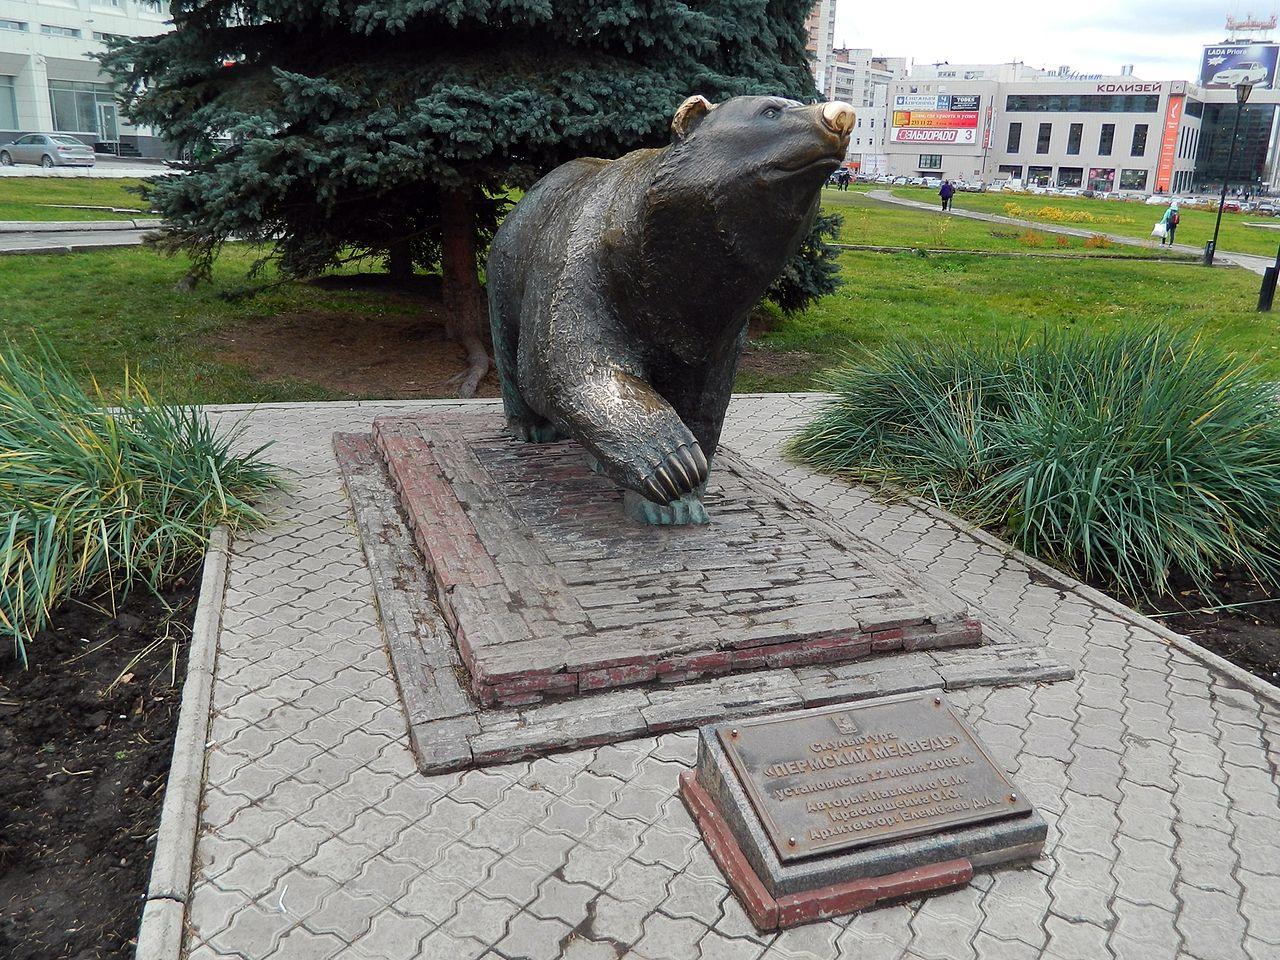 File:RealWorld Bear Statue.jpg